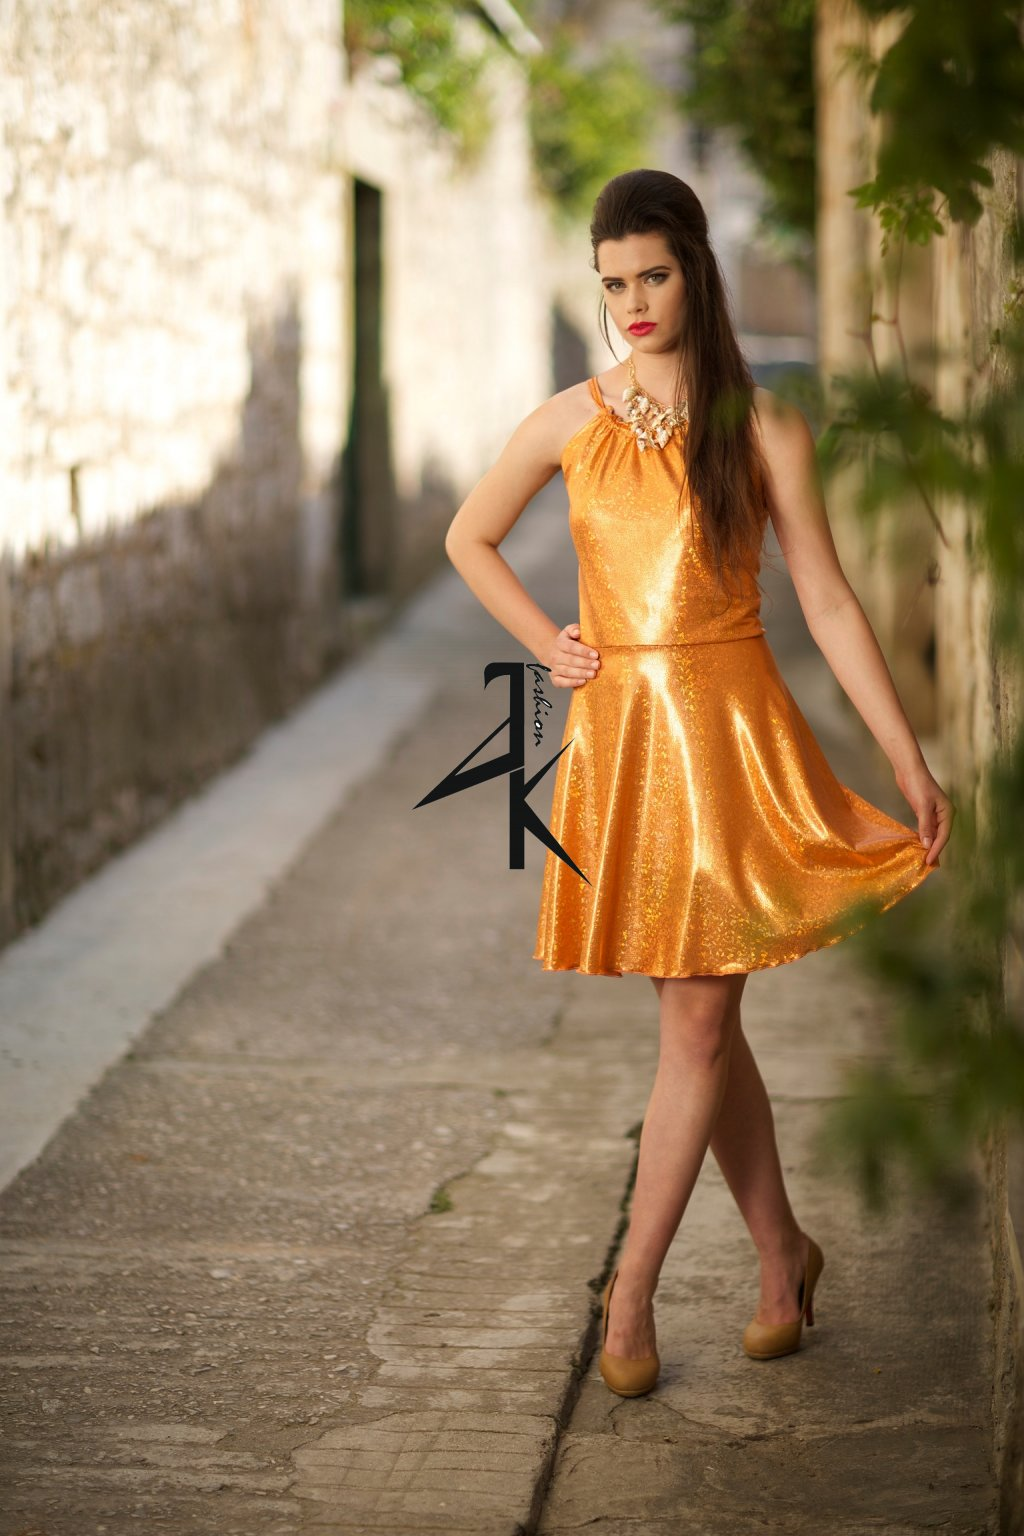 damske saty kratke oranzove trpyt 38 11105503